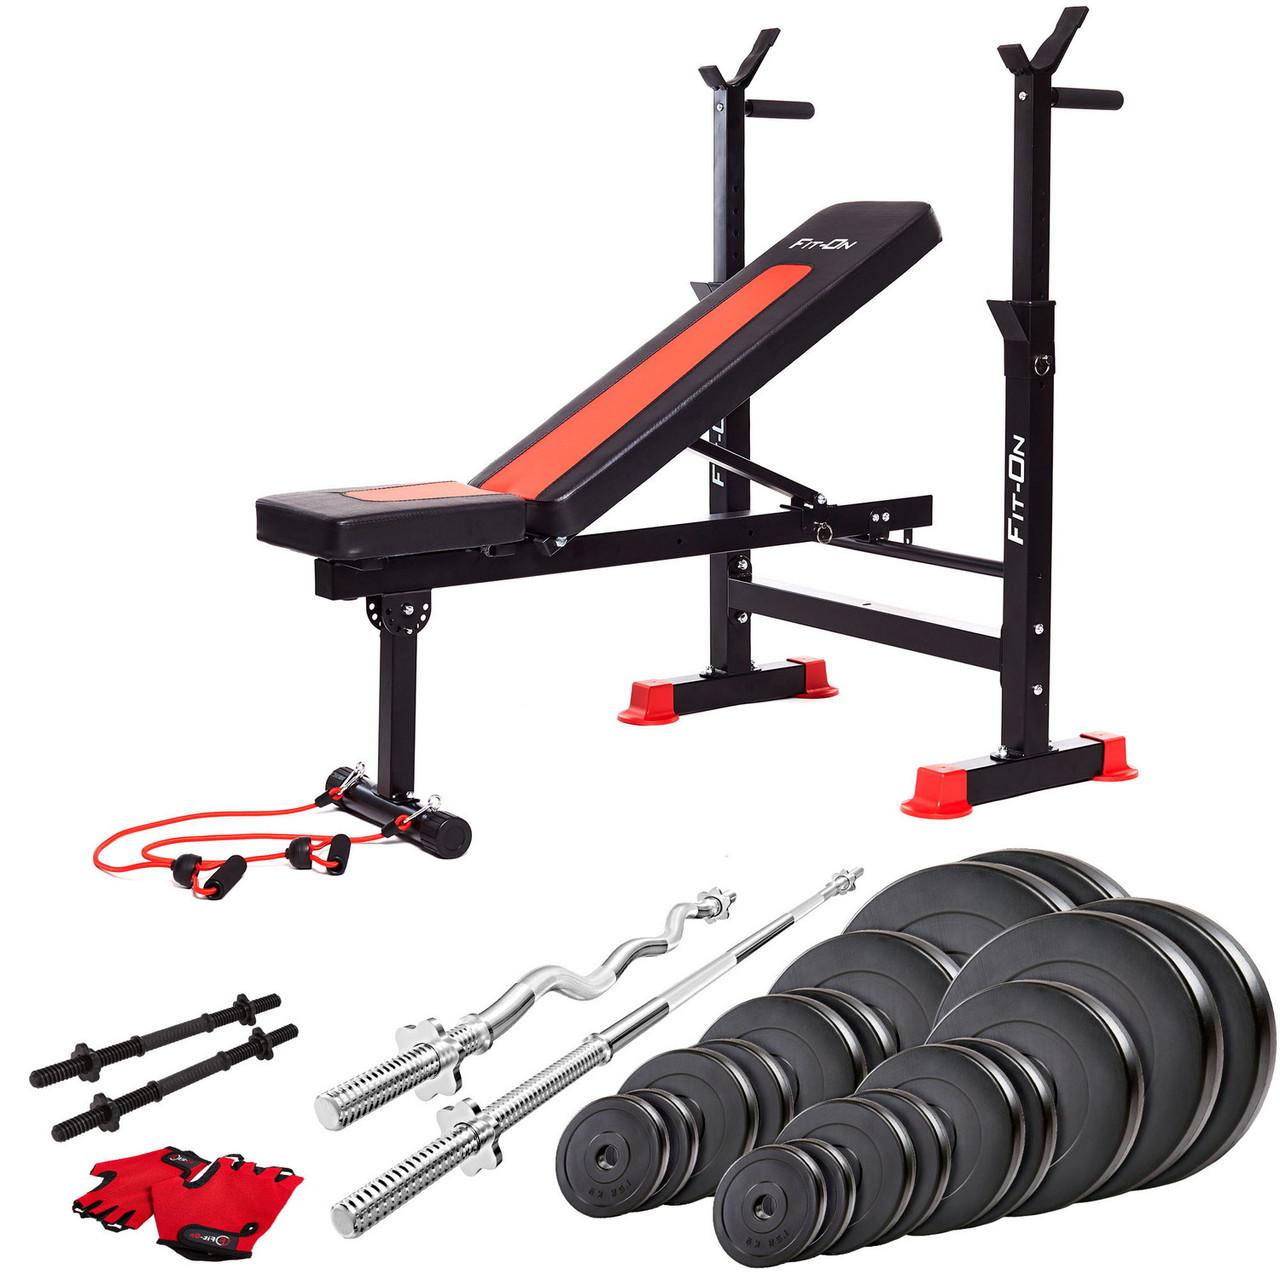 Функціональна лава тренувальна Fit-On FN-S101 + штанга і гантелі 135 кг для зміцнення м'язів тіла